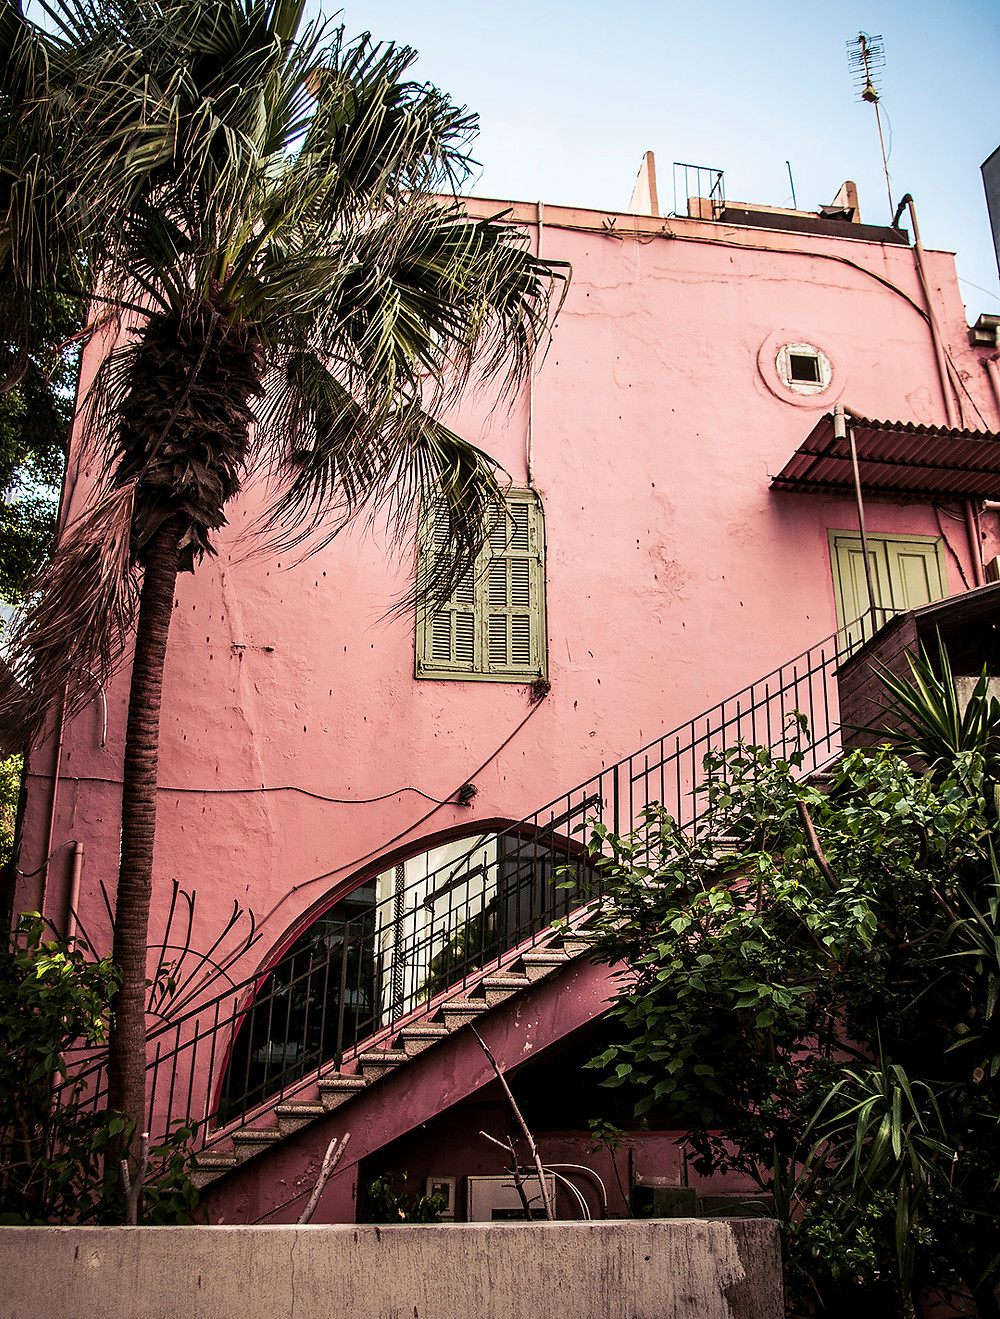 Pink building in Acrafieh, Beirut